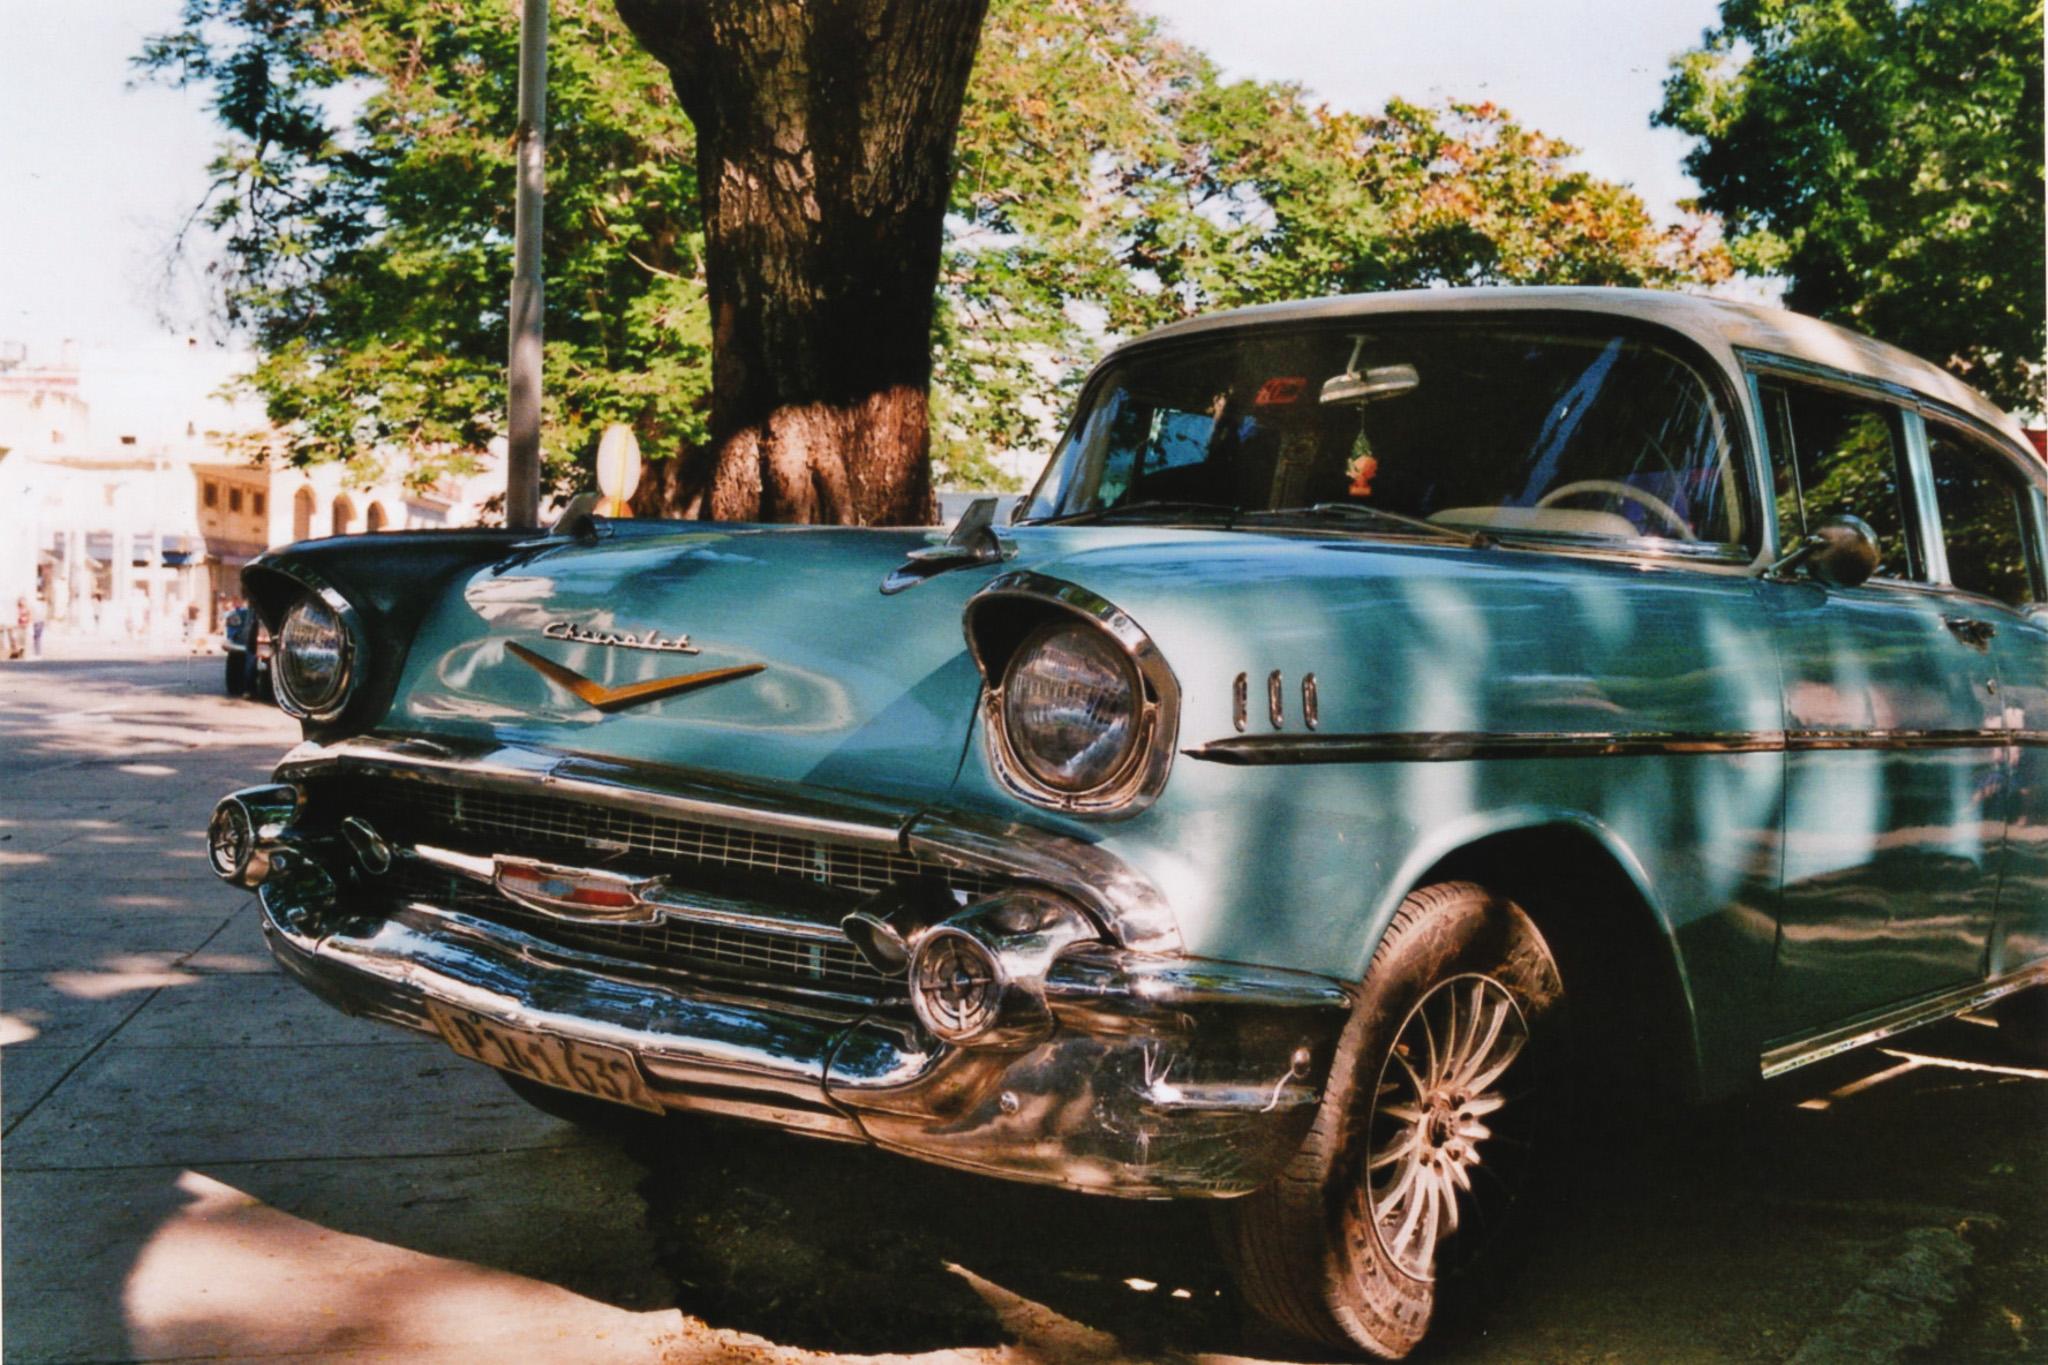 Kuba-2017-12-Analog-031.jpg